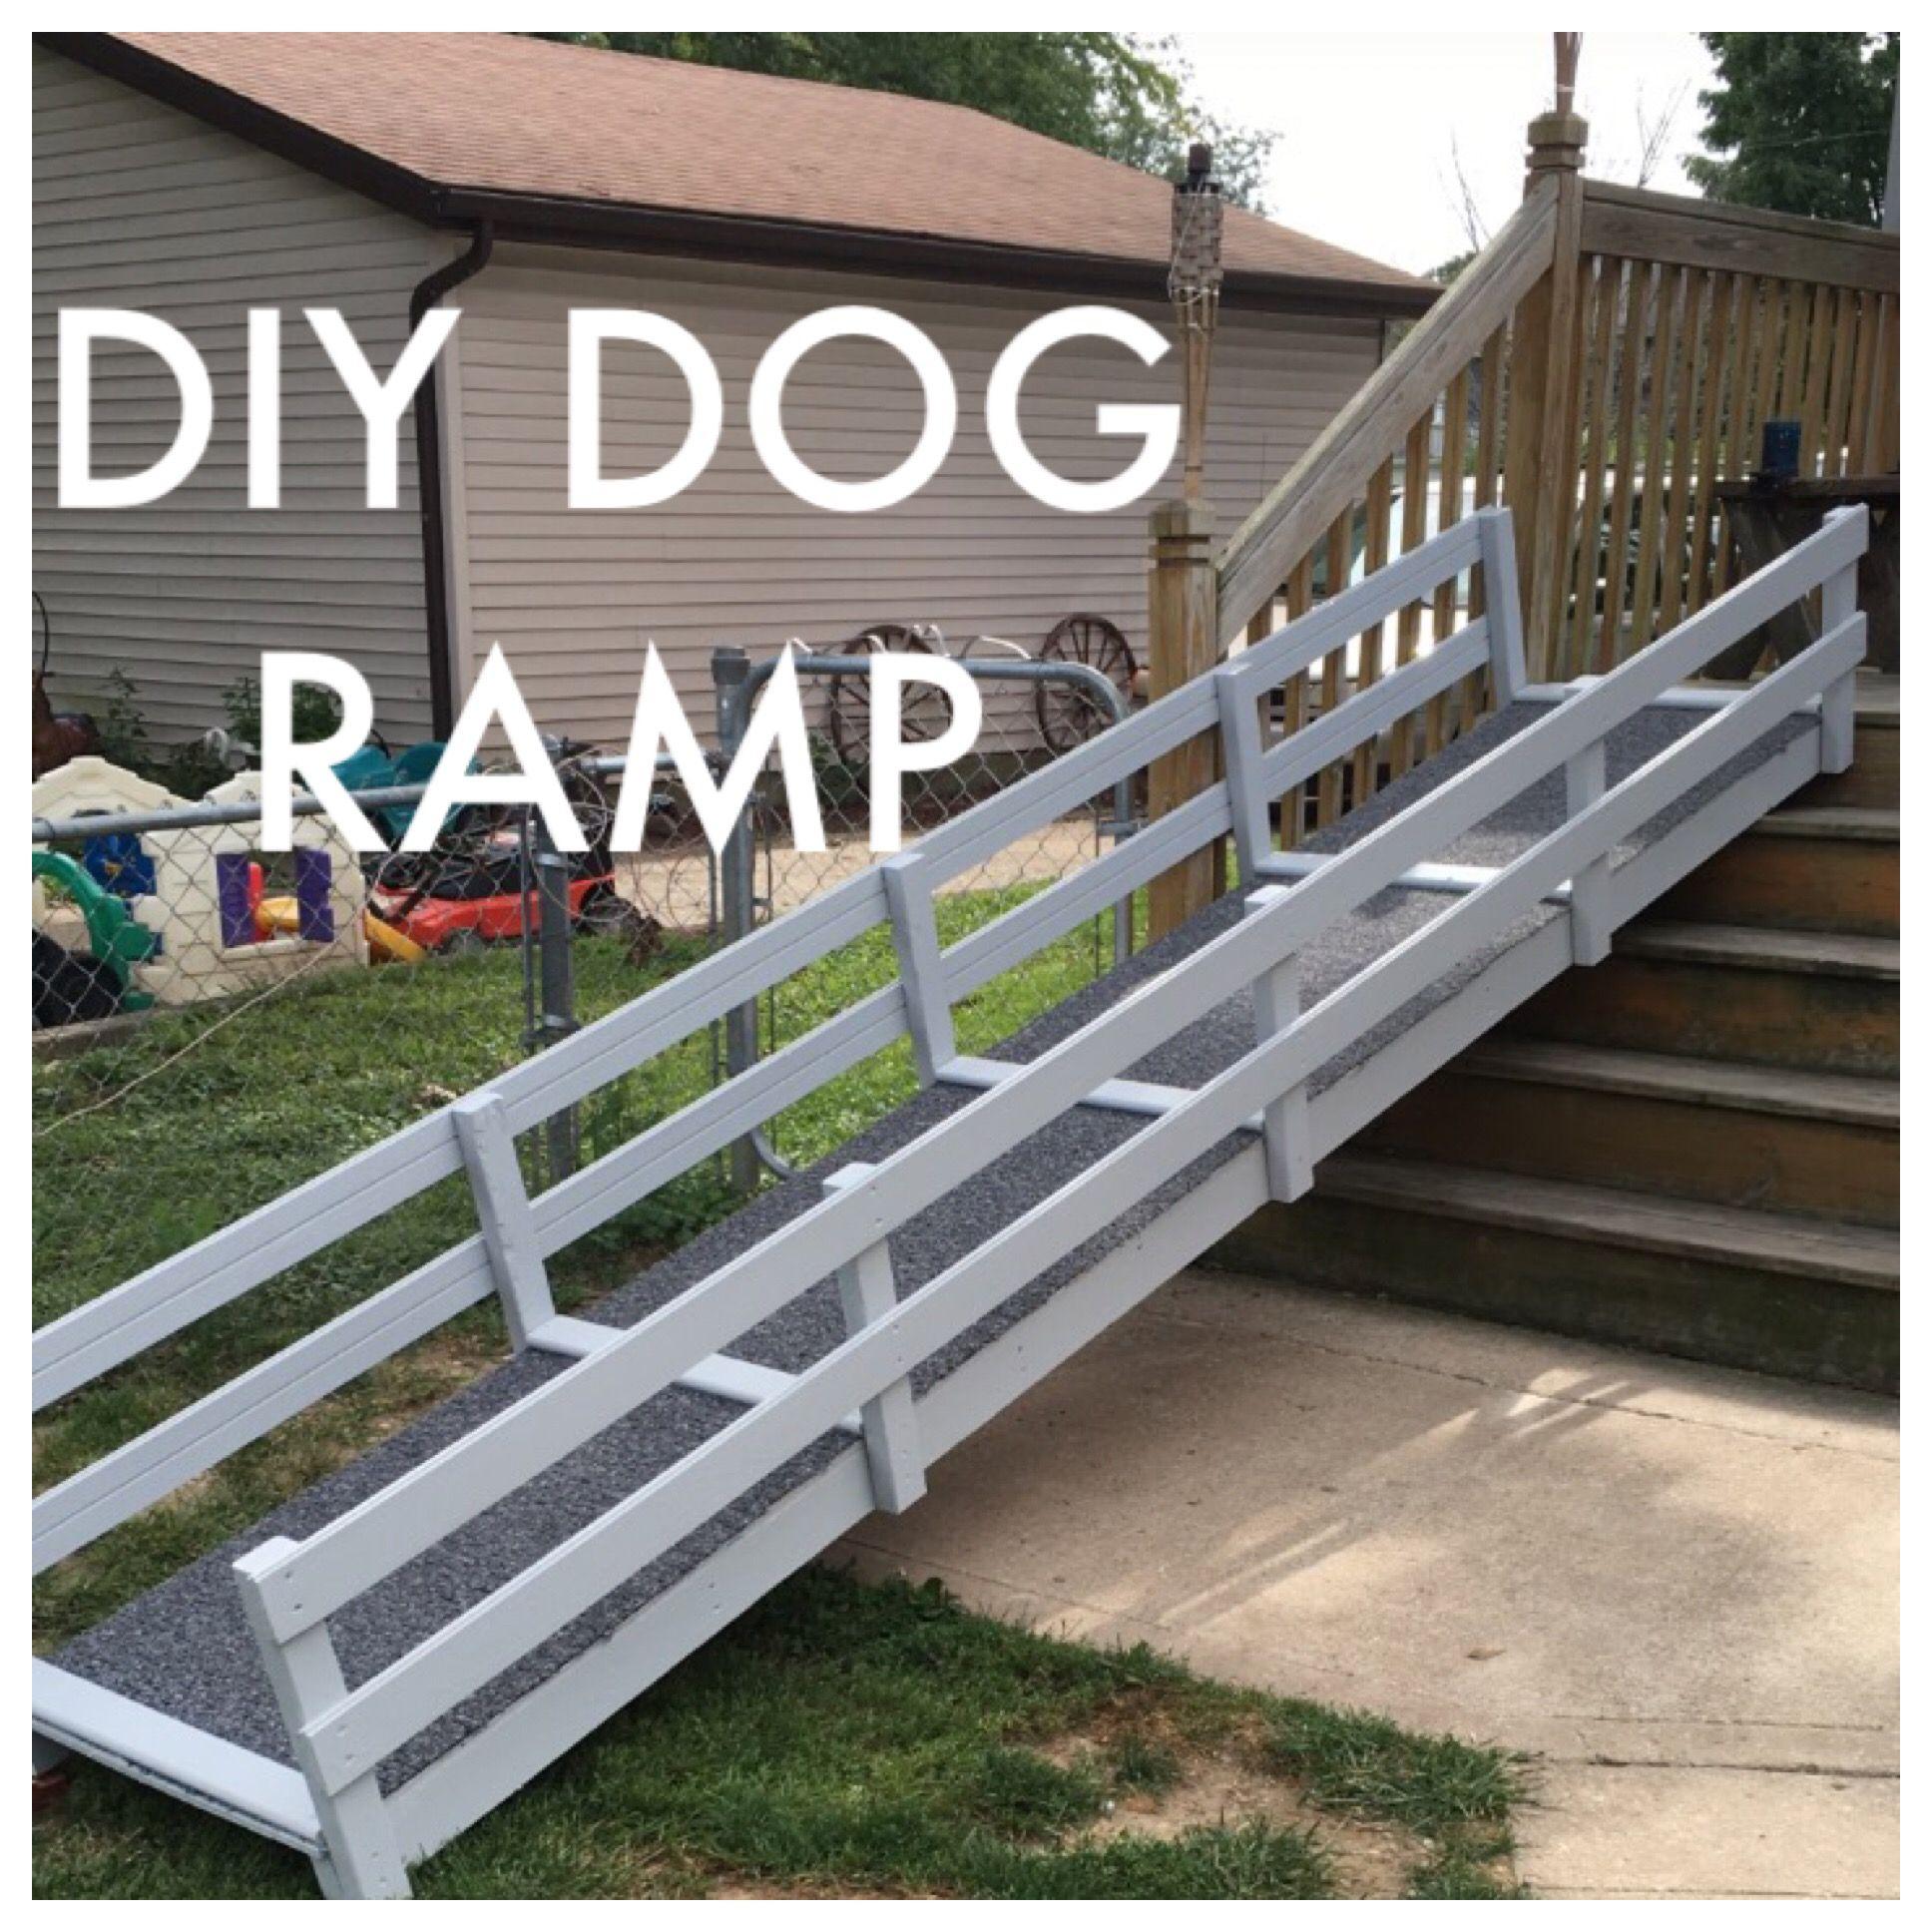 Diy dog ramp over stairs dog ramp diy dog ramp dog ramp